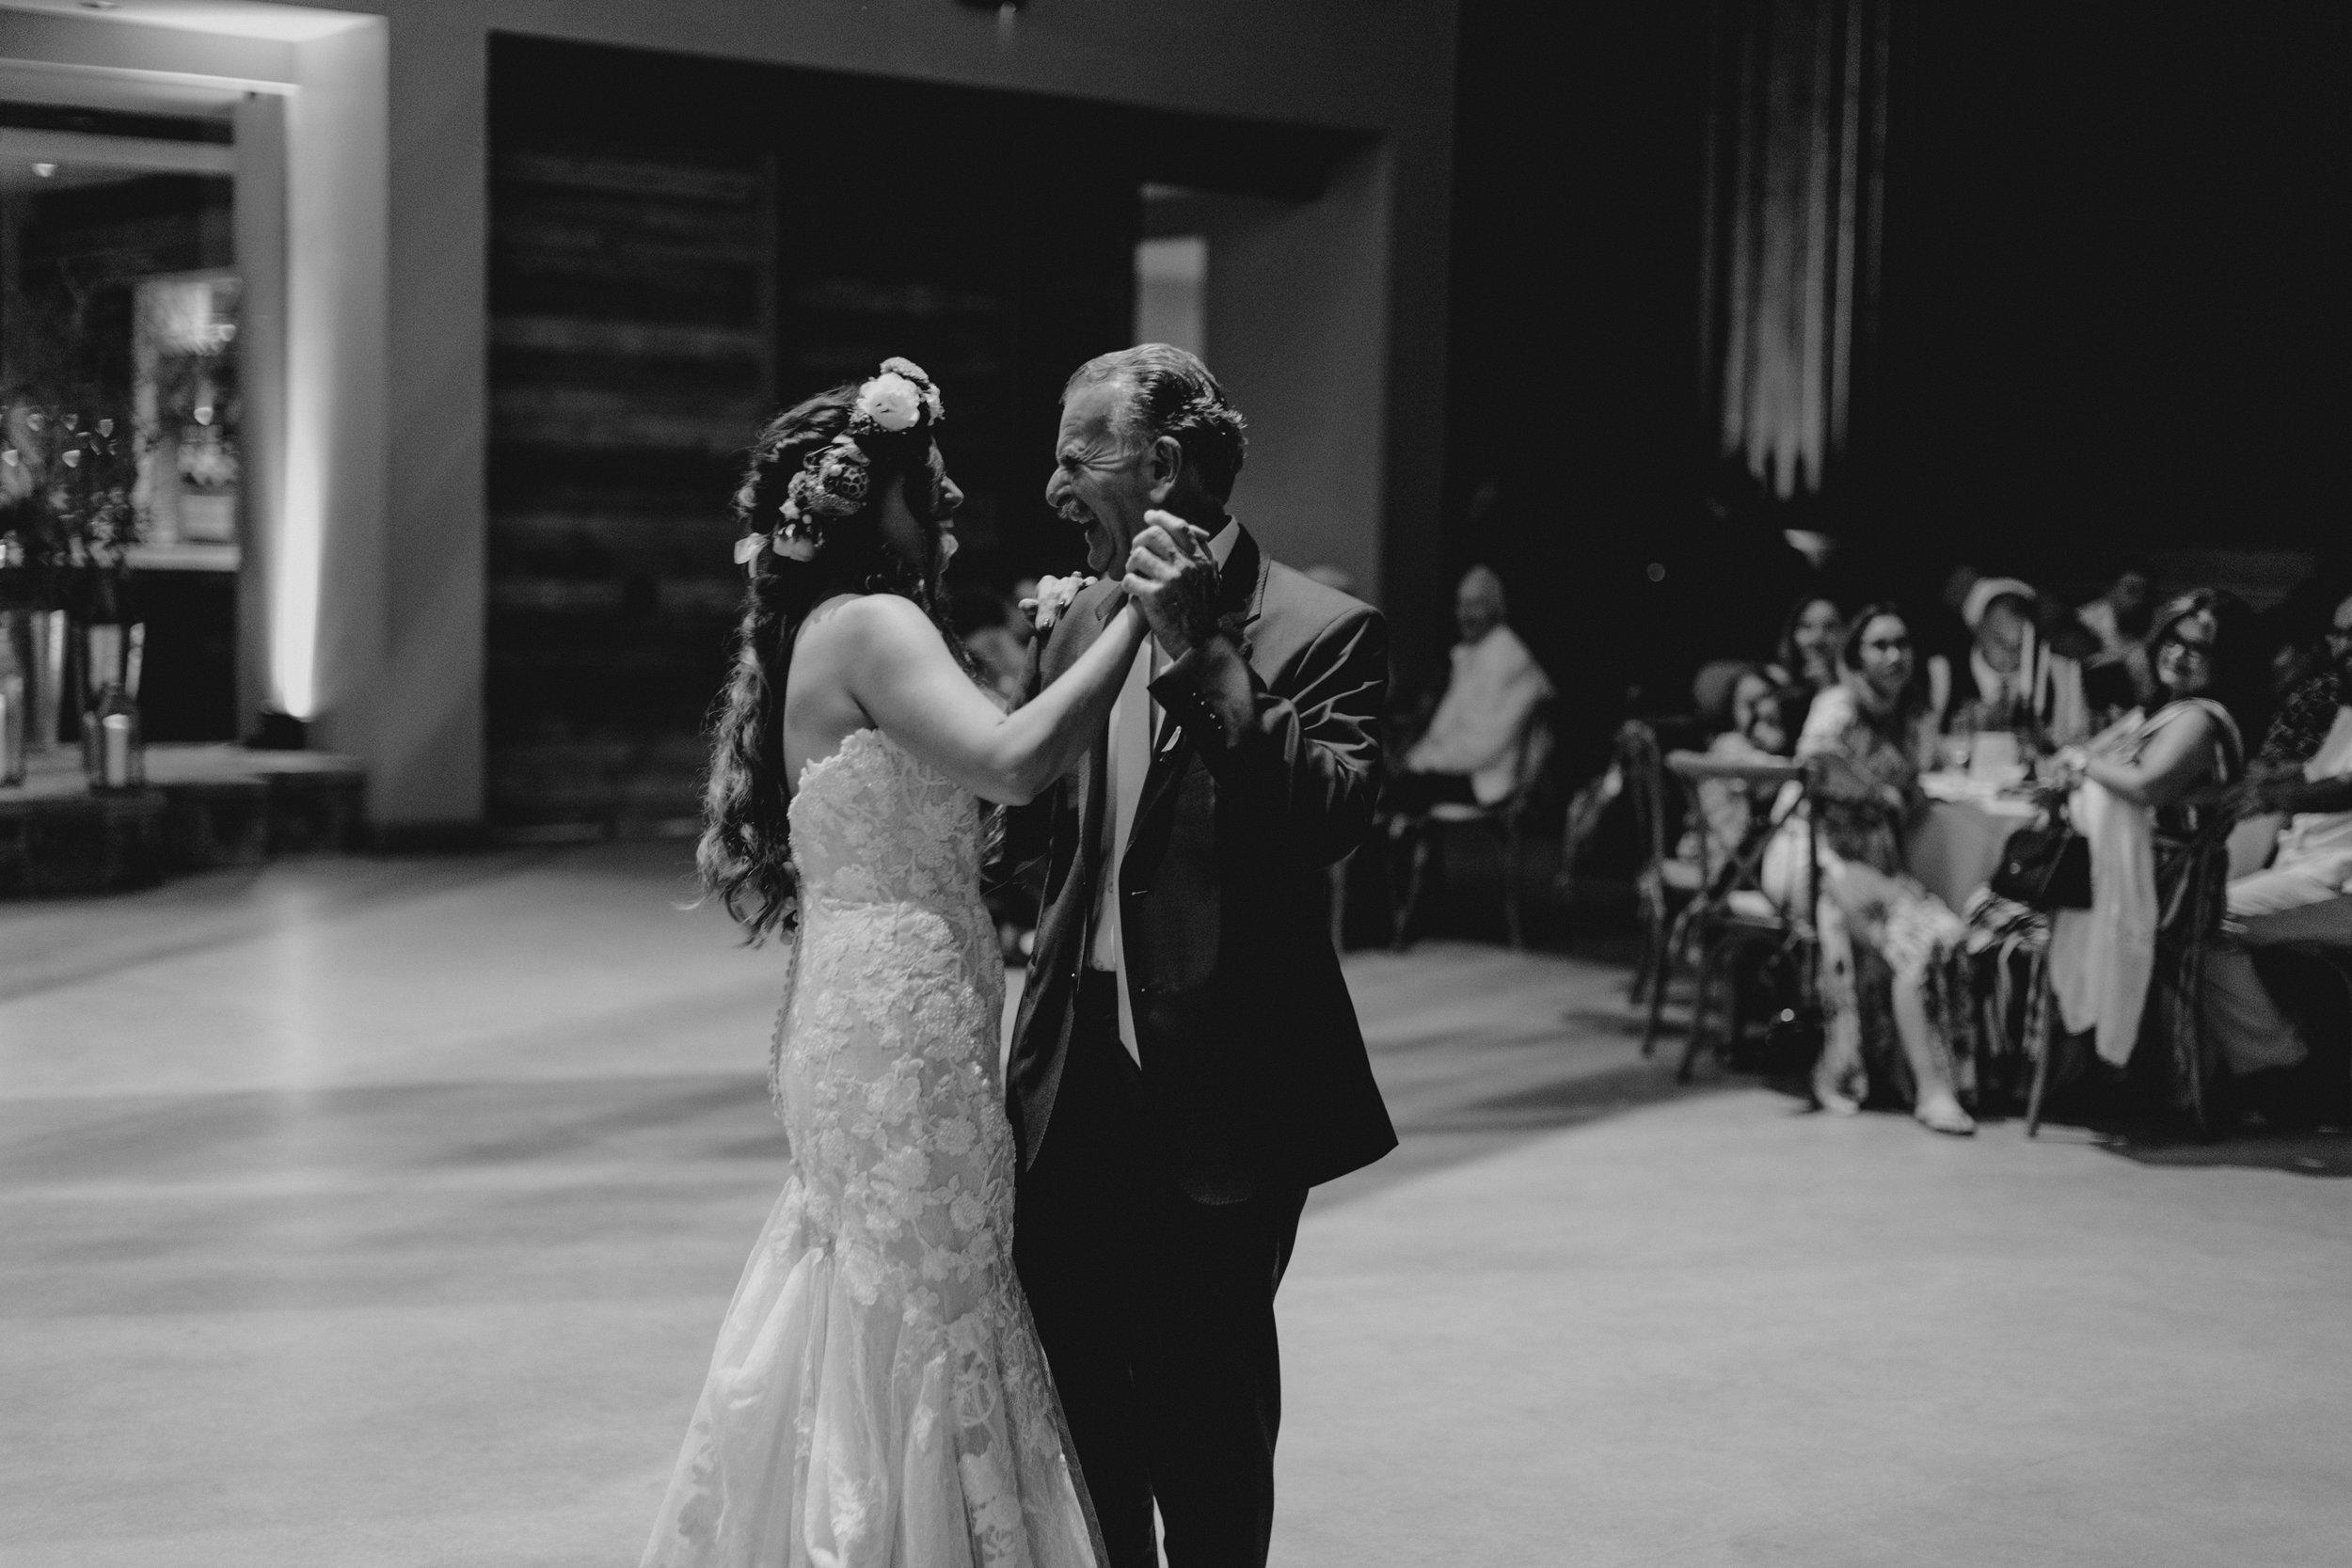 WeddingphotographersinSanDiego.jpg